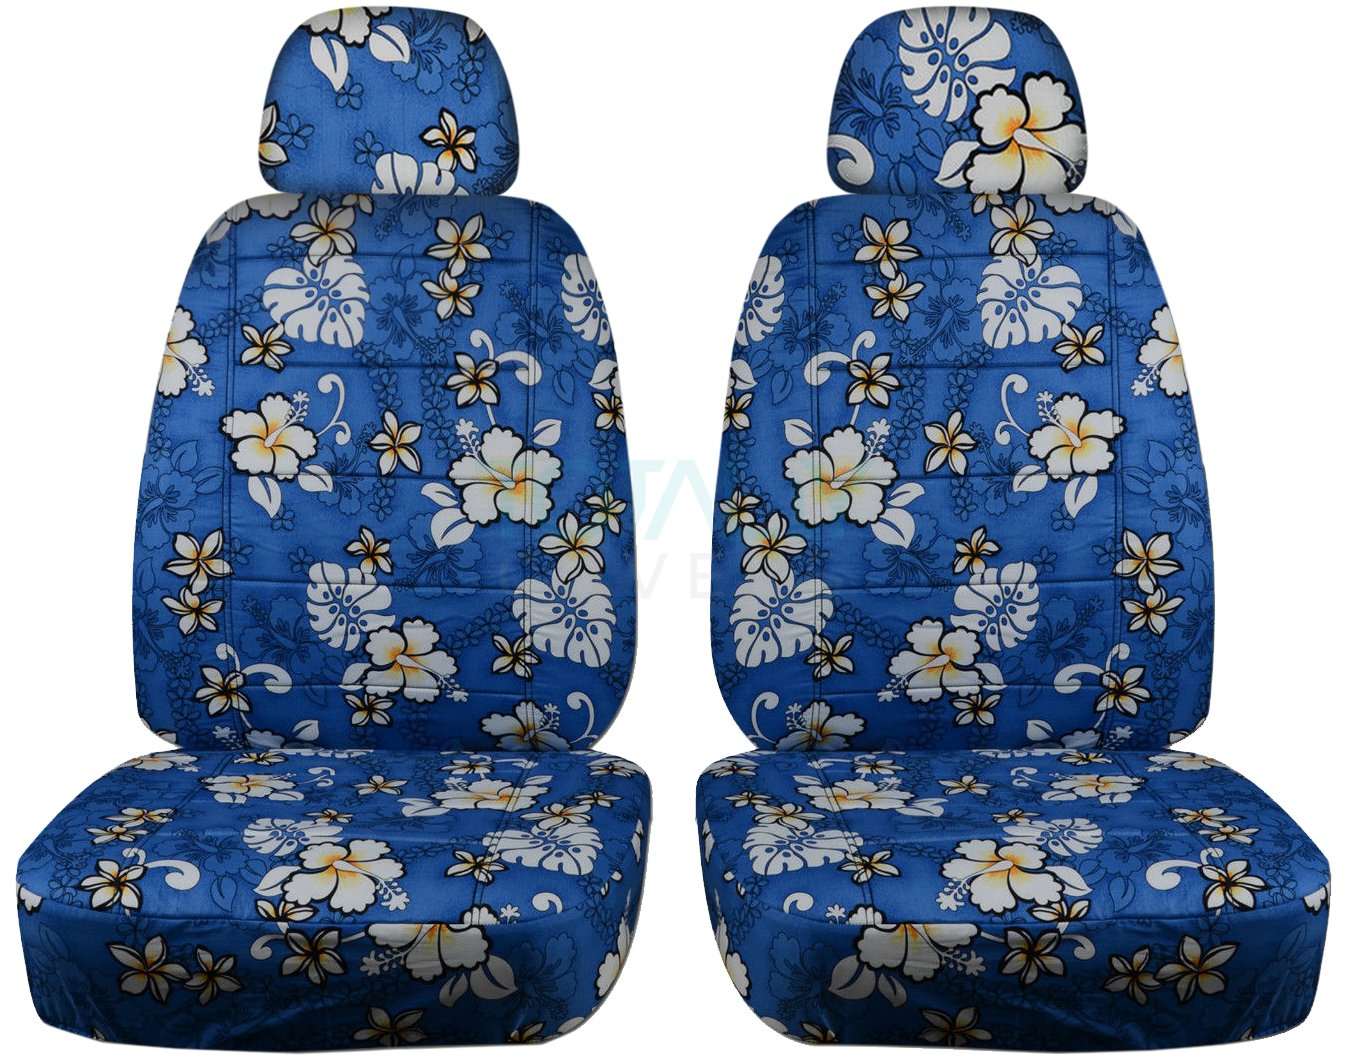 Amazon hawaiian print car seat covers w 2 separate headrest amazon hawaiian print car seat covers w 2 separate headrest covers blue w flowers semi custom fit front will make fit any cartruckvansuv 4 izmirmasajfo Choice Image